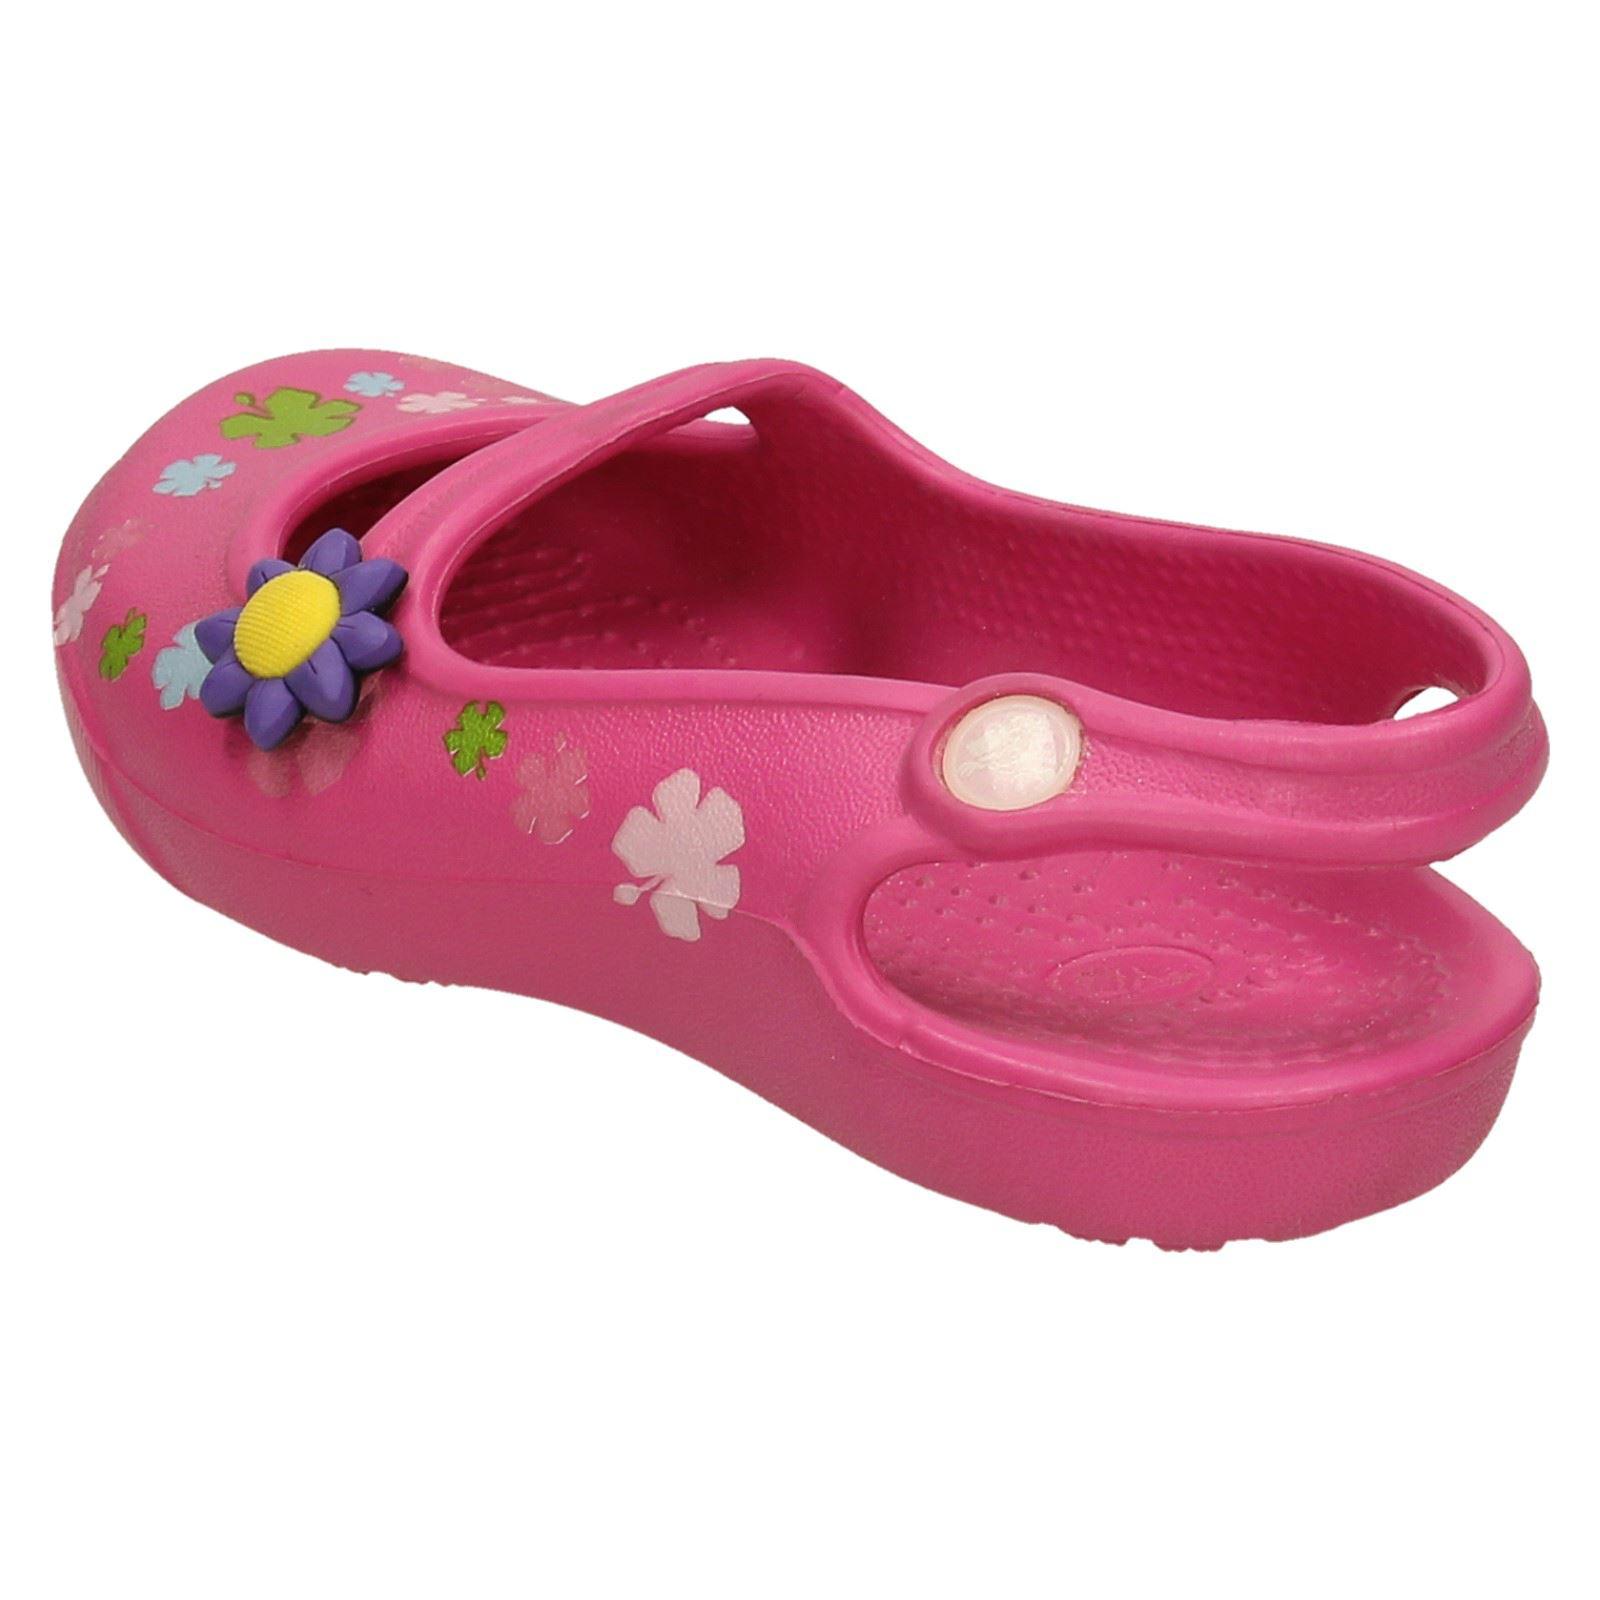 Girls Crocs Slip On Sandals *Gabby Flowers*